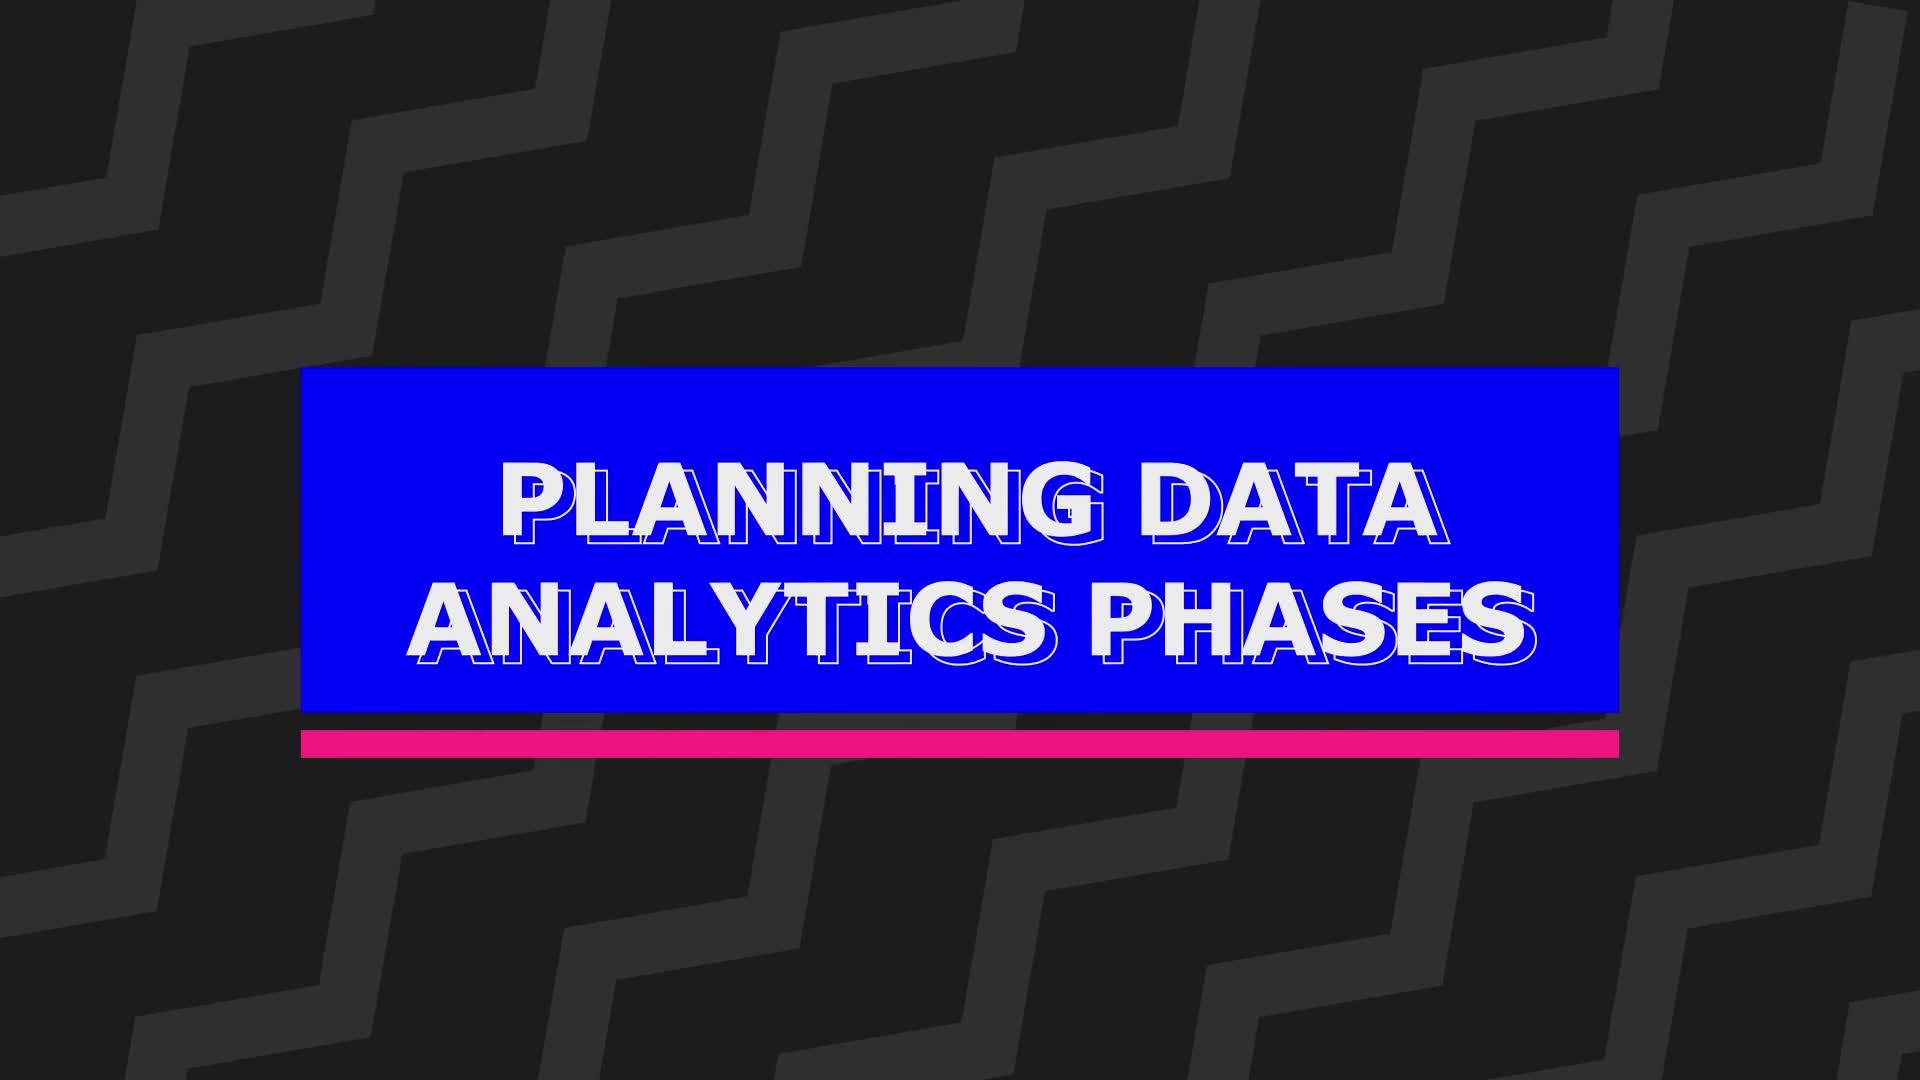 Plan the data analytics phases